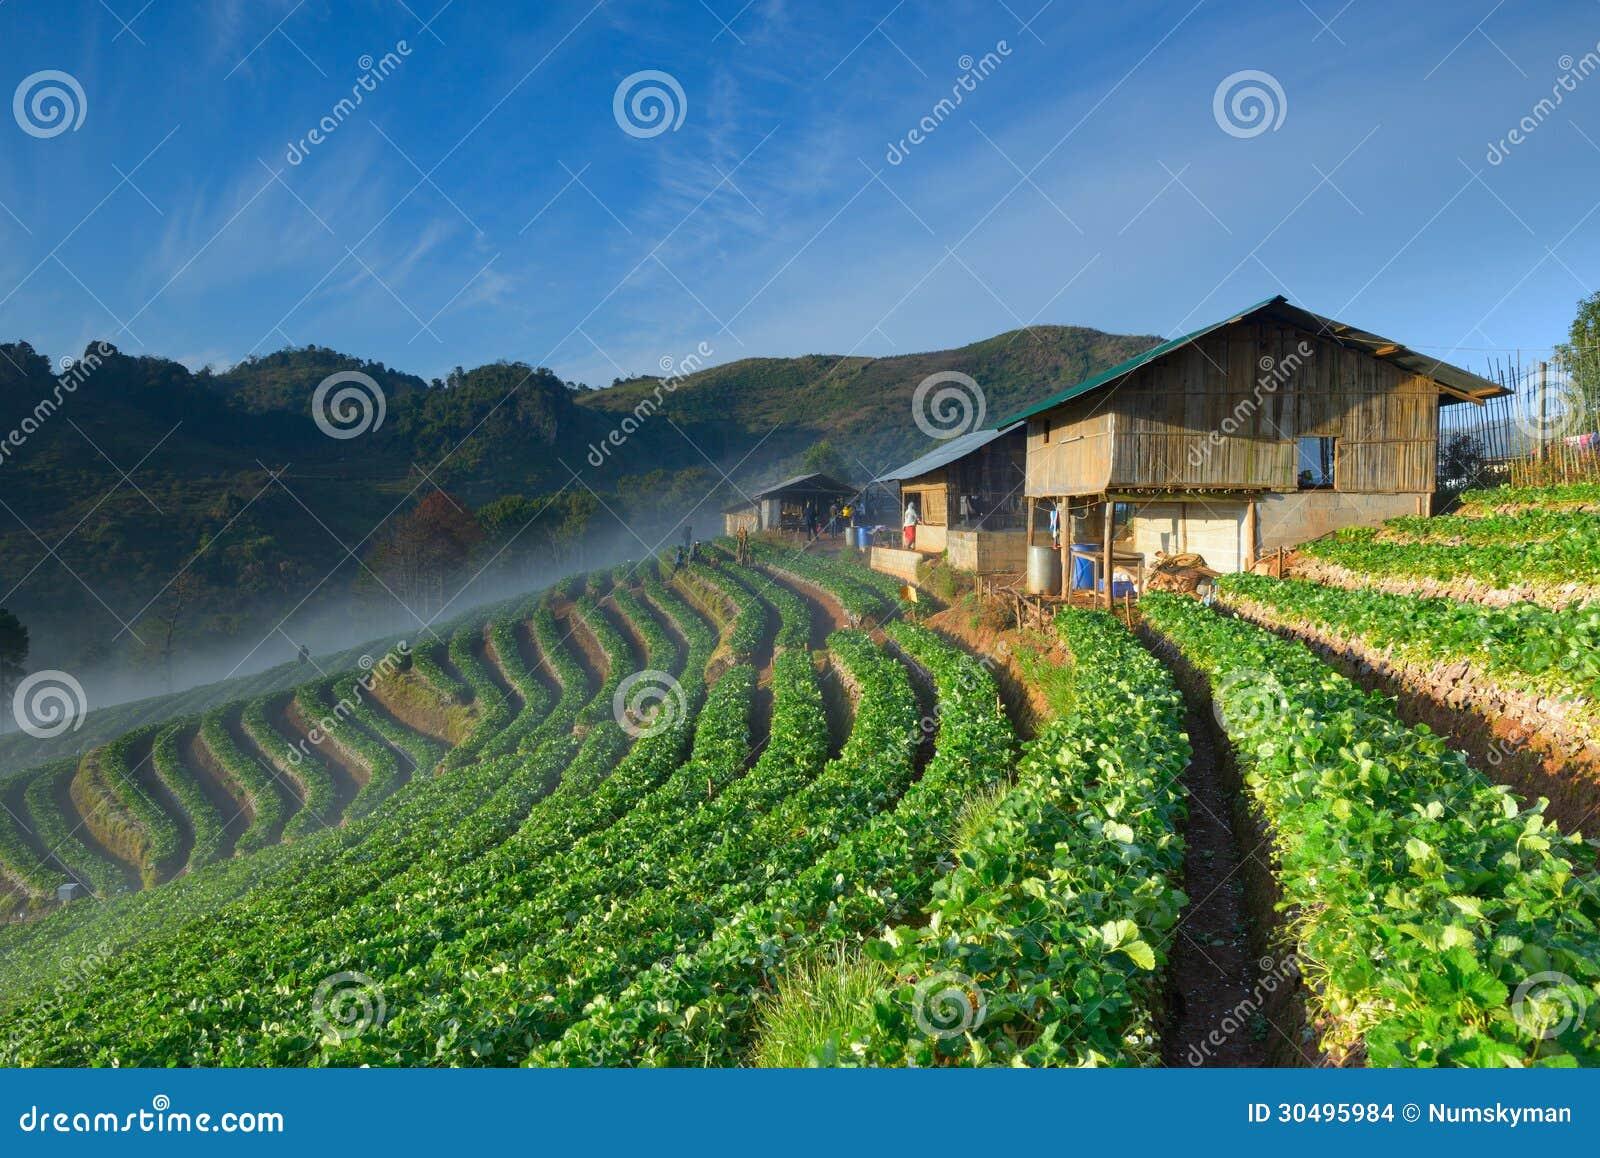 Mooi aardbeilandbouwbedrijf en Thais landbouwershuis op heuvel